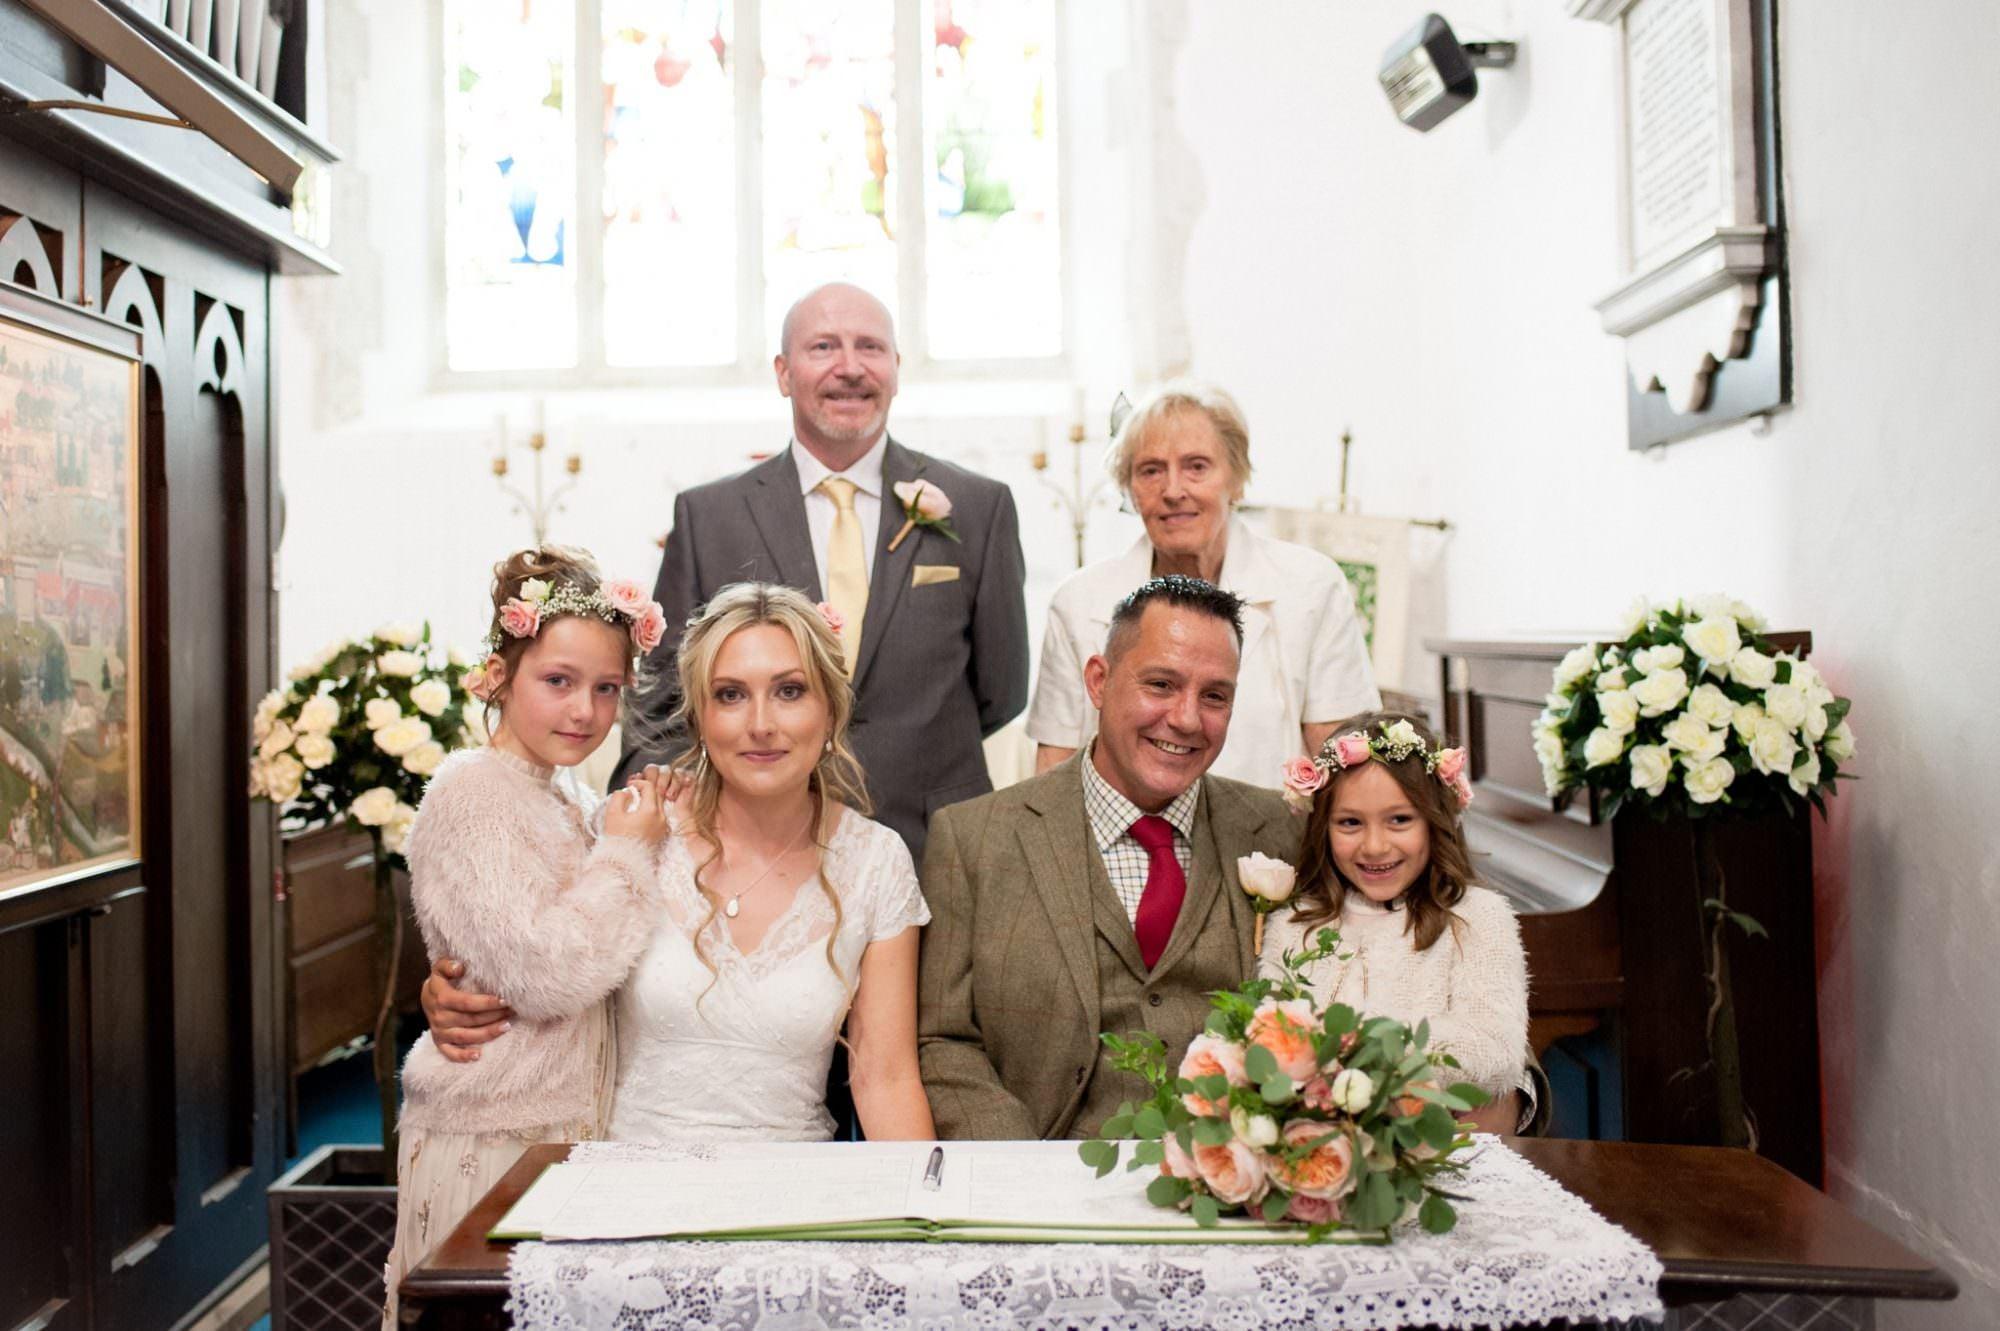 Family photograph at Sopley Church